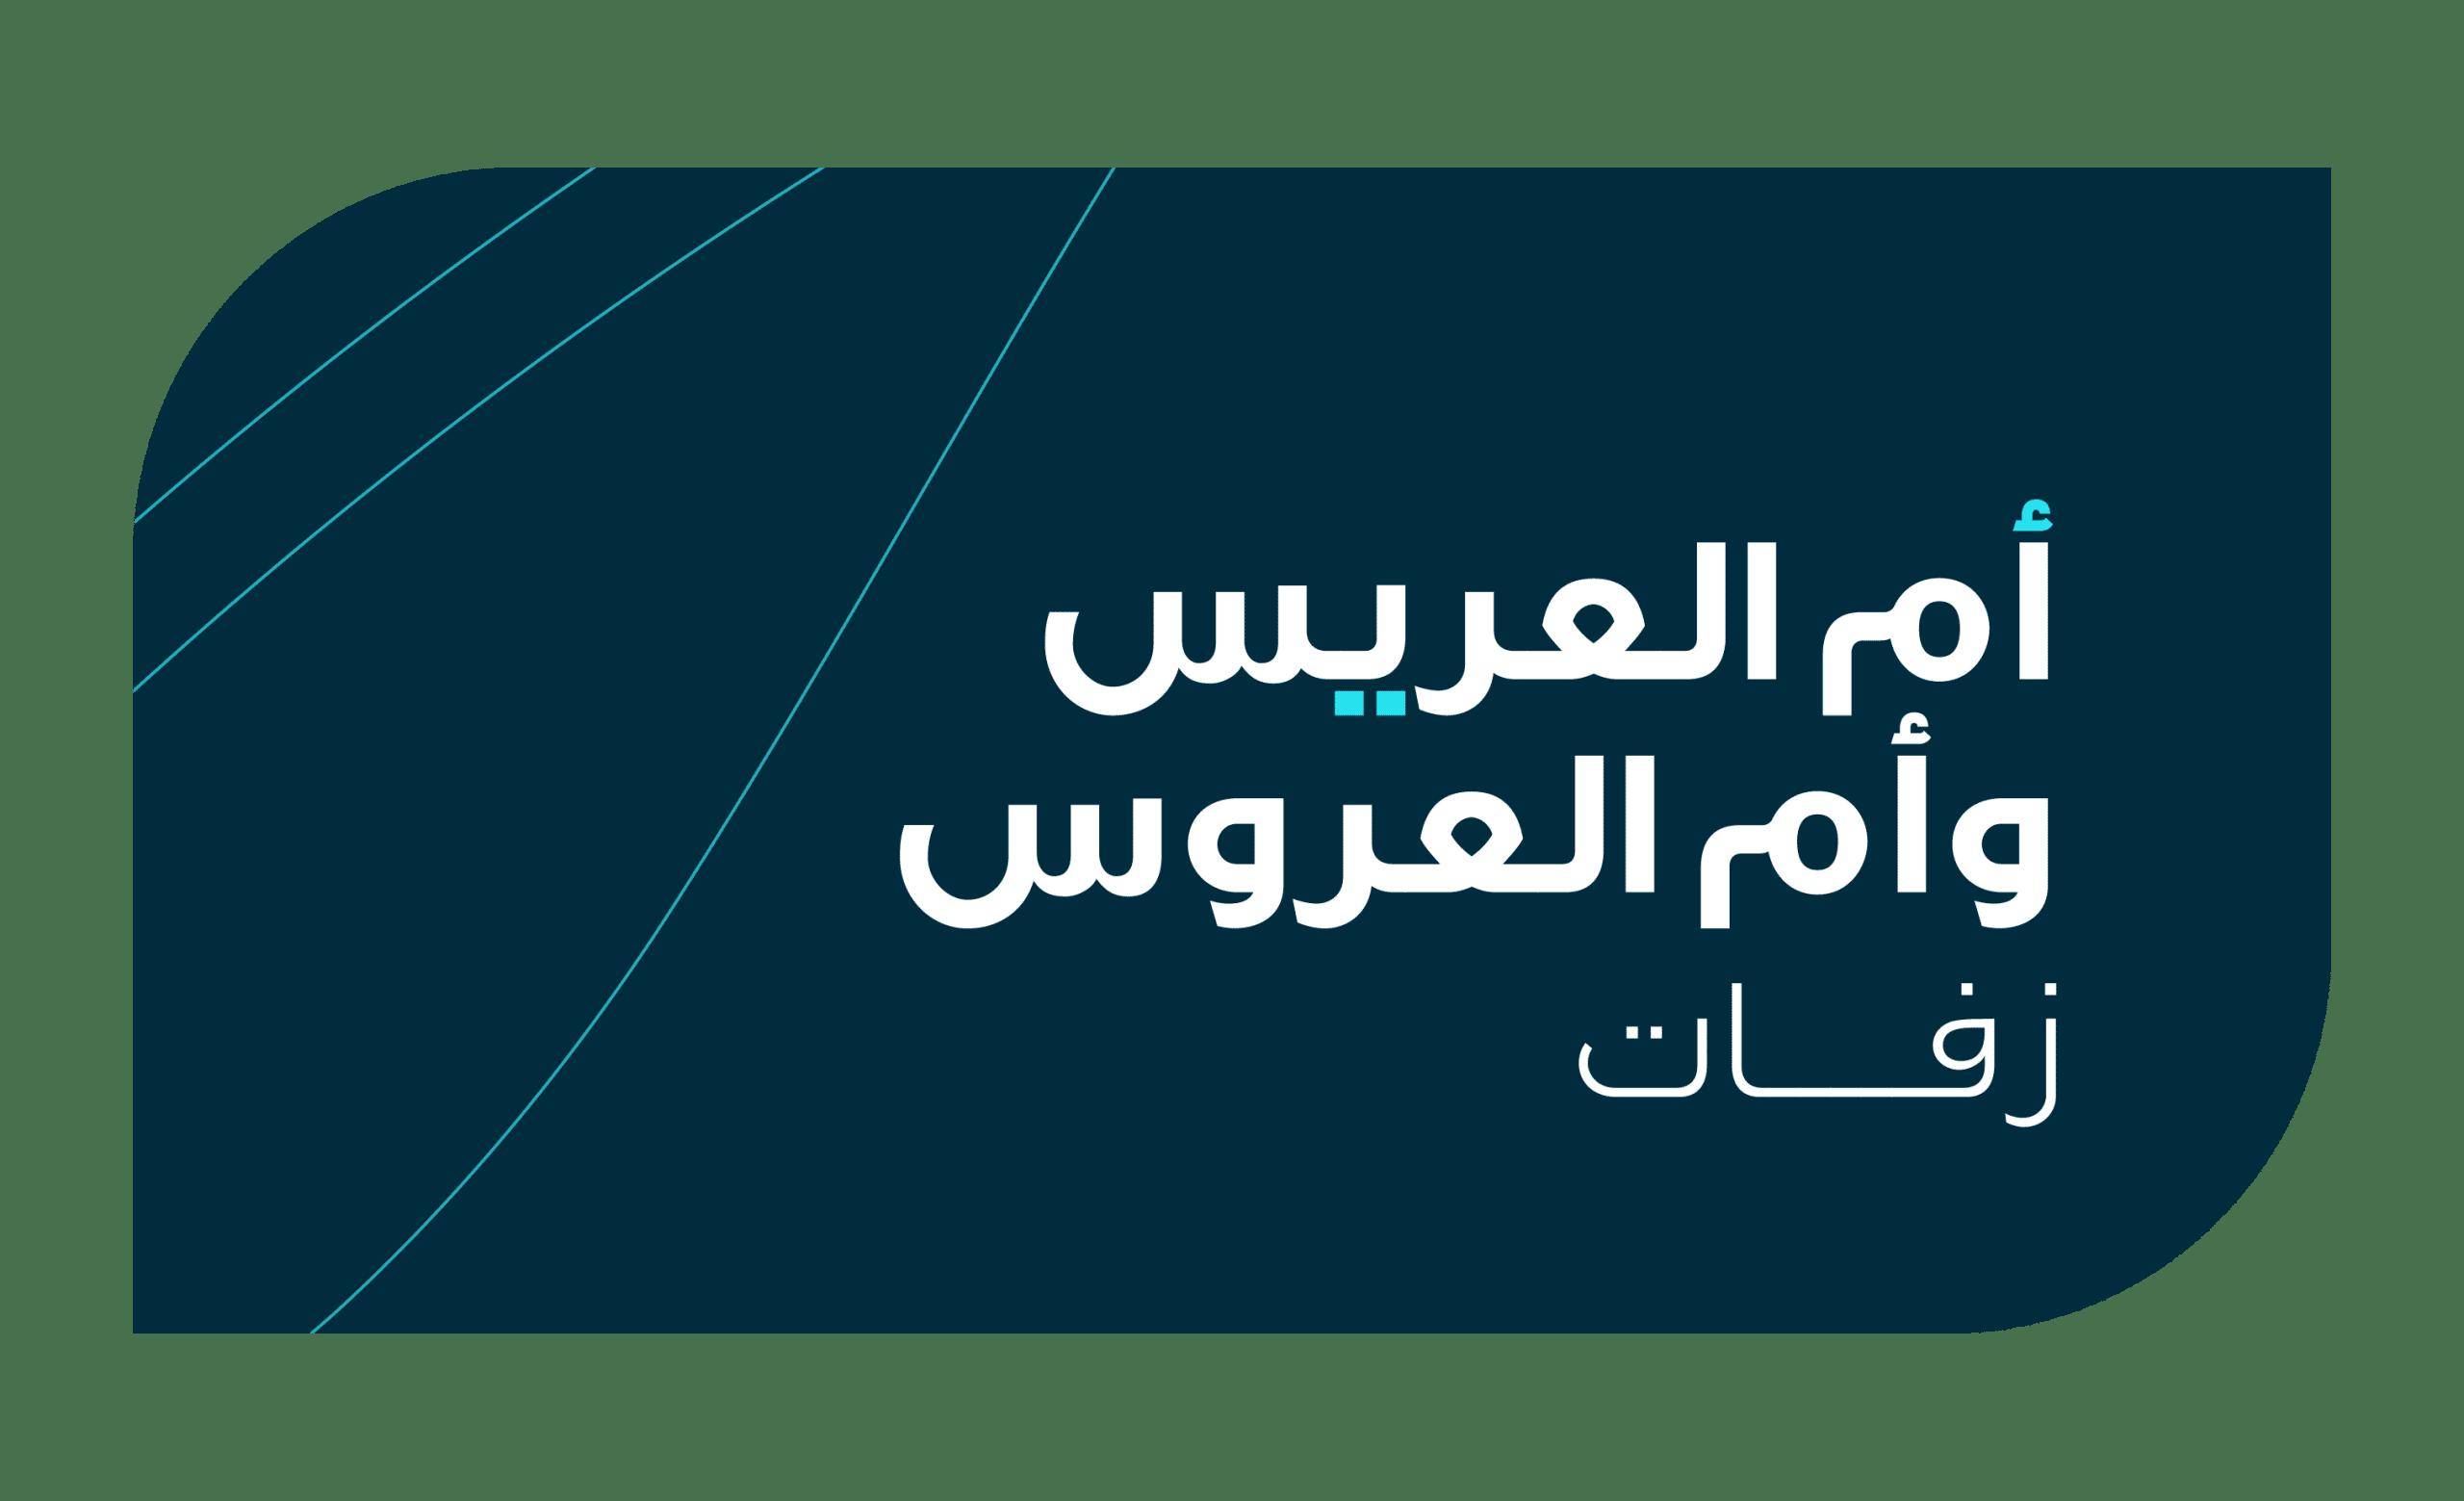 شيله ام العريس 2019 زفه مدح 1